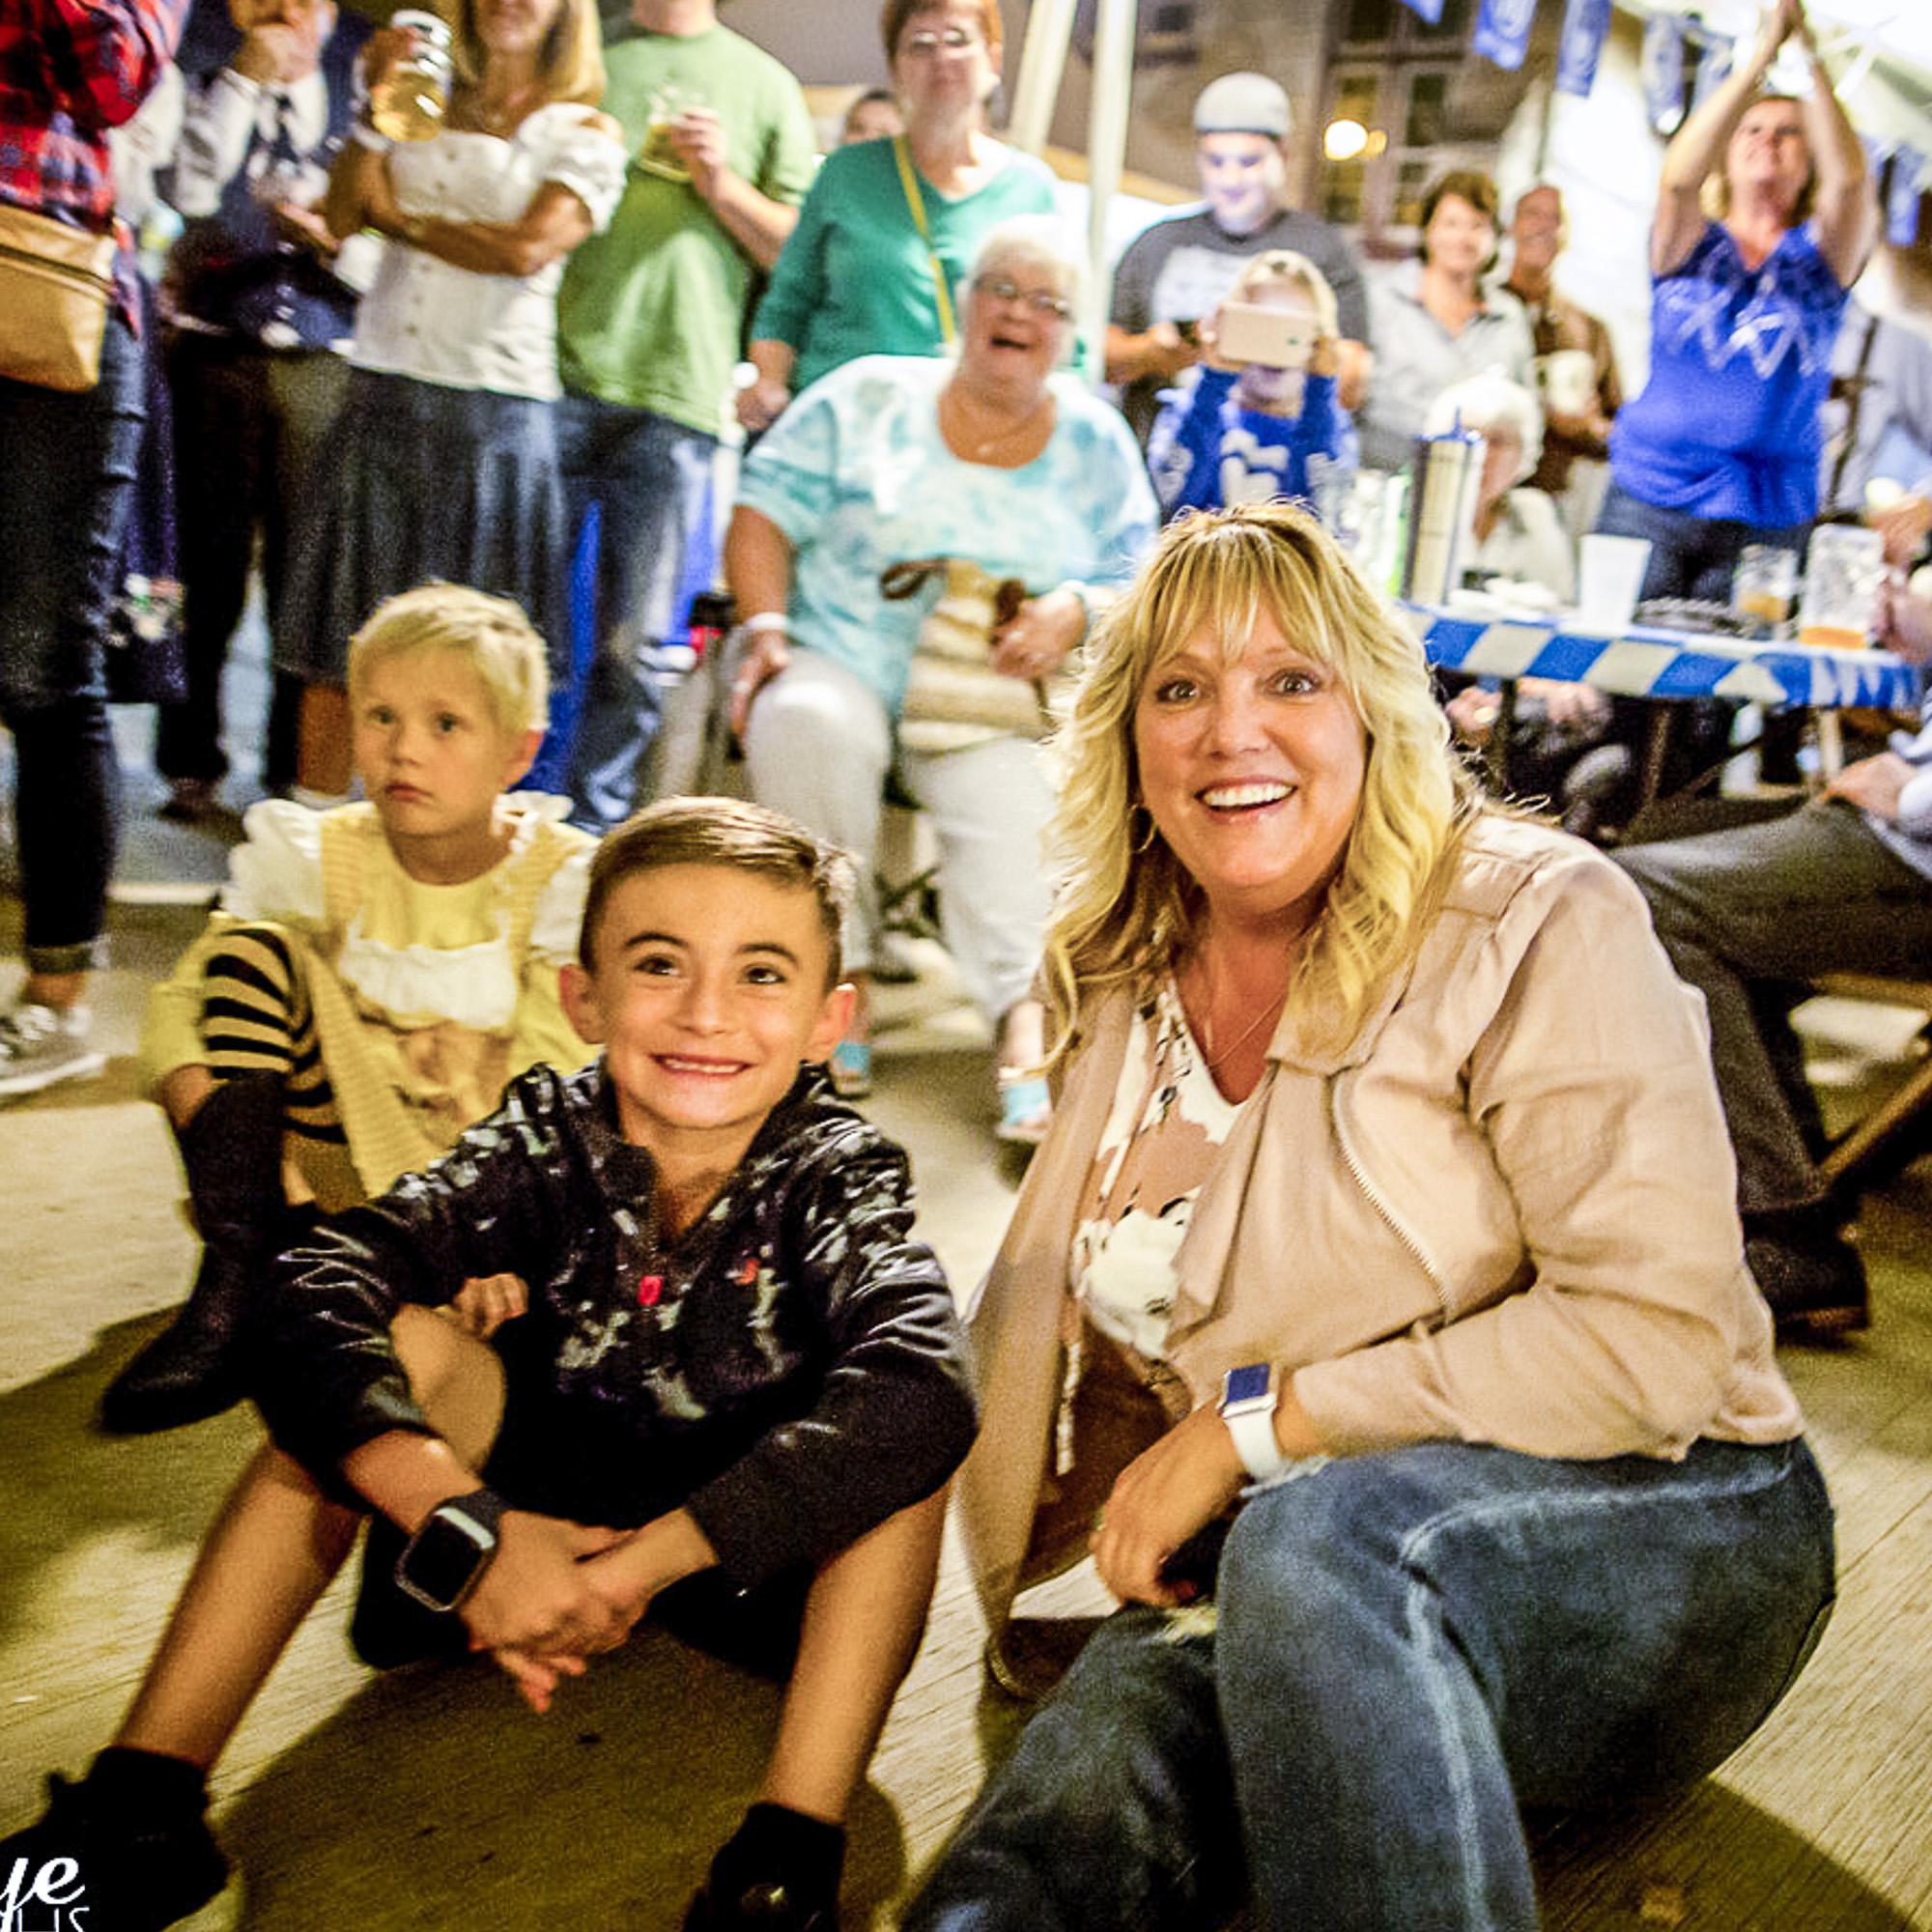 ACTIVITIES - Kids Area, best of local beer challenge, Stein Holding, Barley to Barrel classes & More